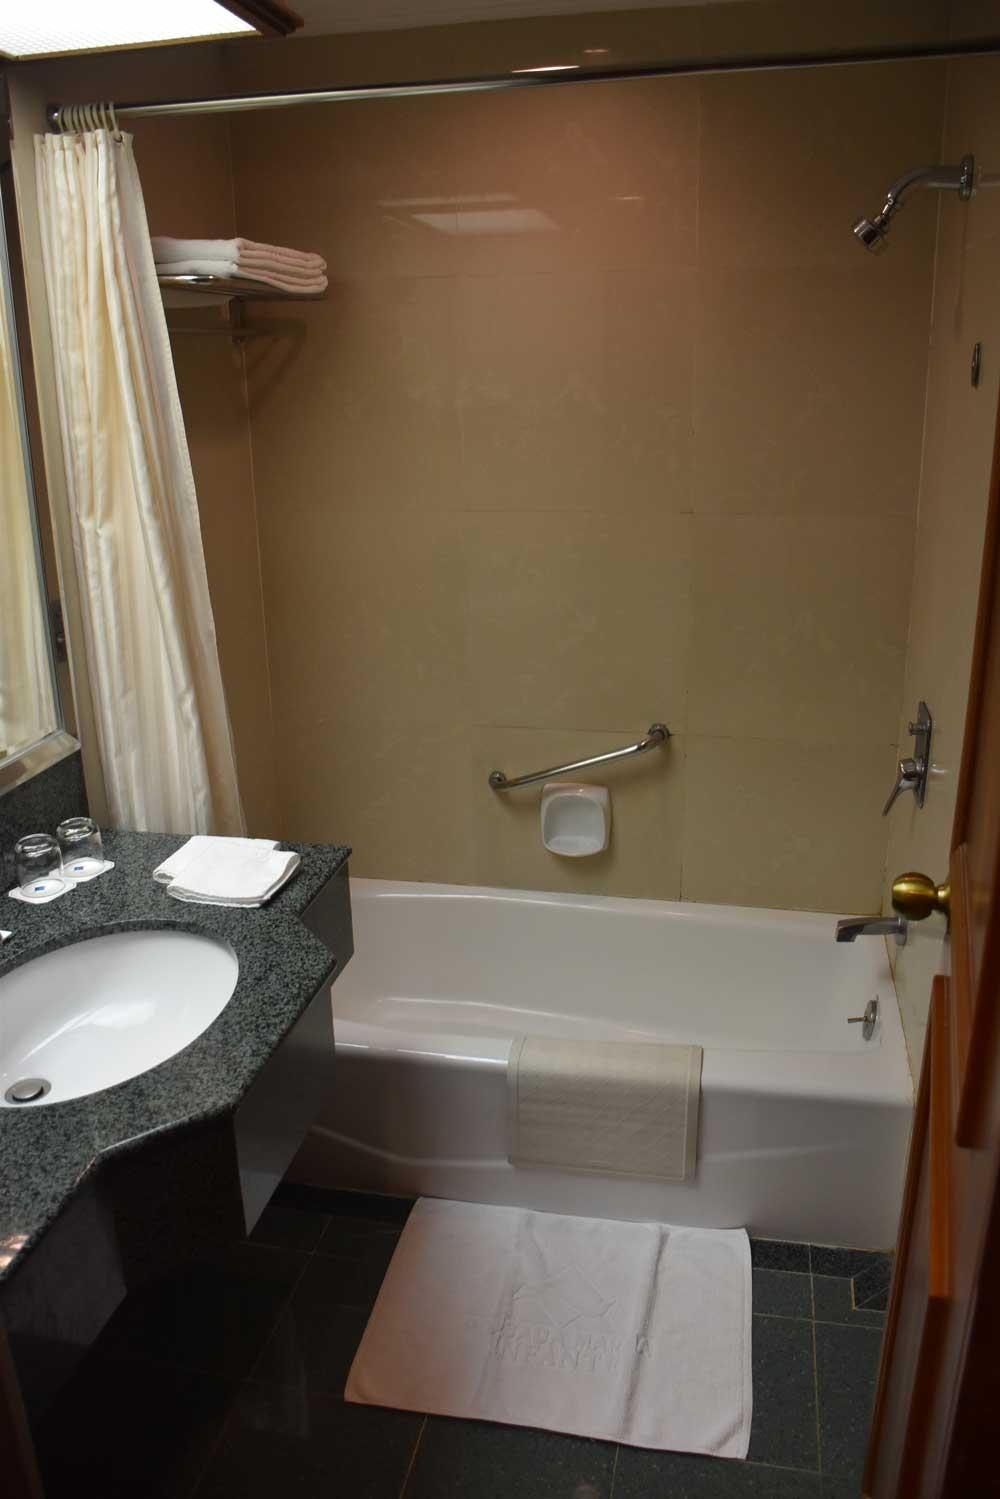 Pousada Marina Infante bathroom